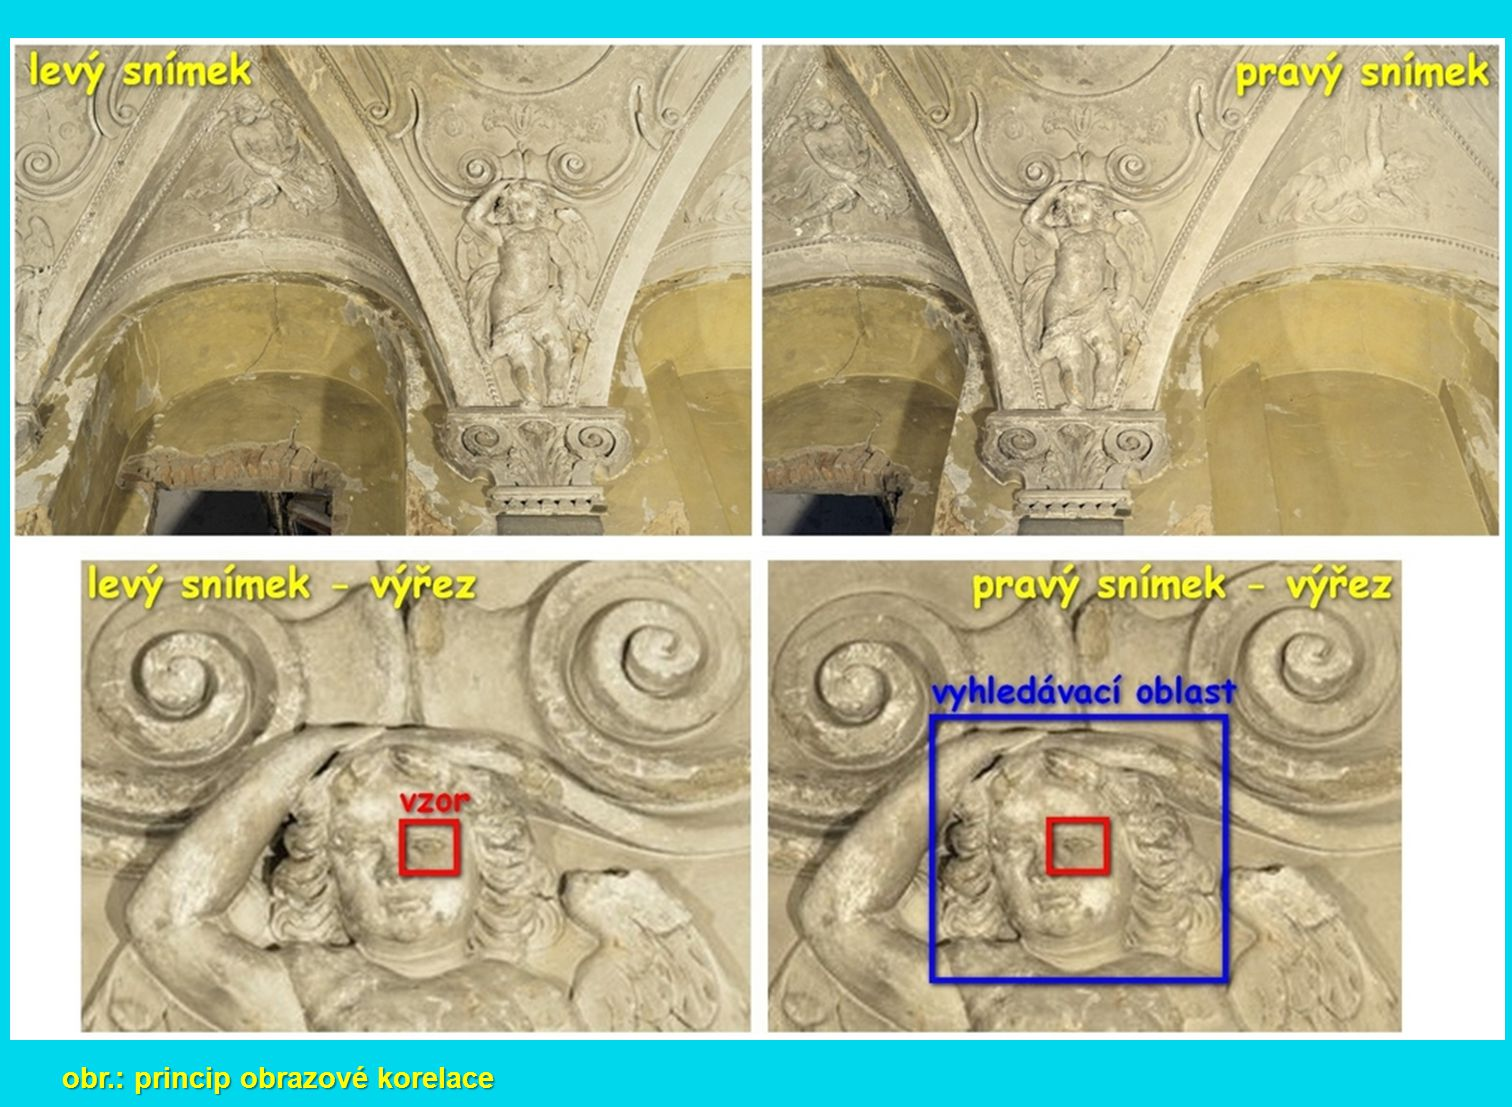 obr.: princip obrazové korelace